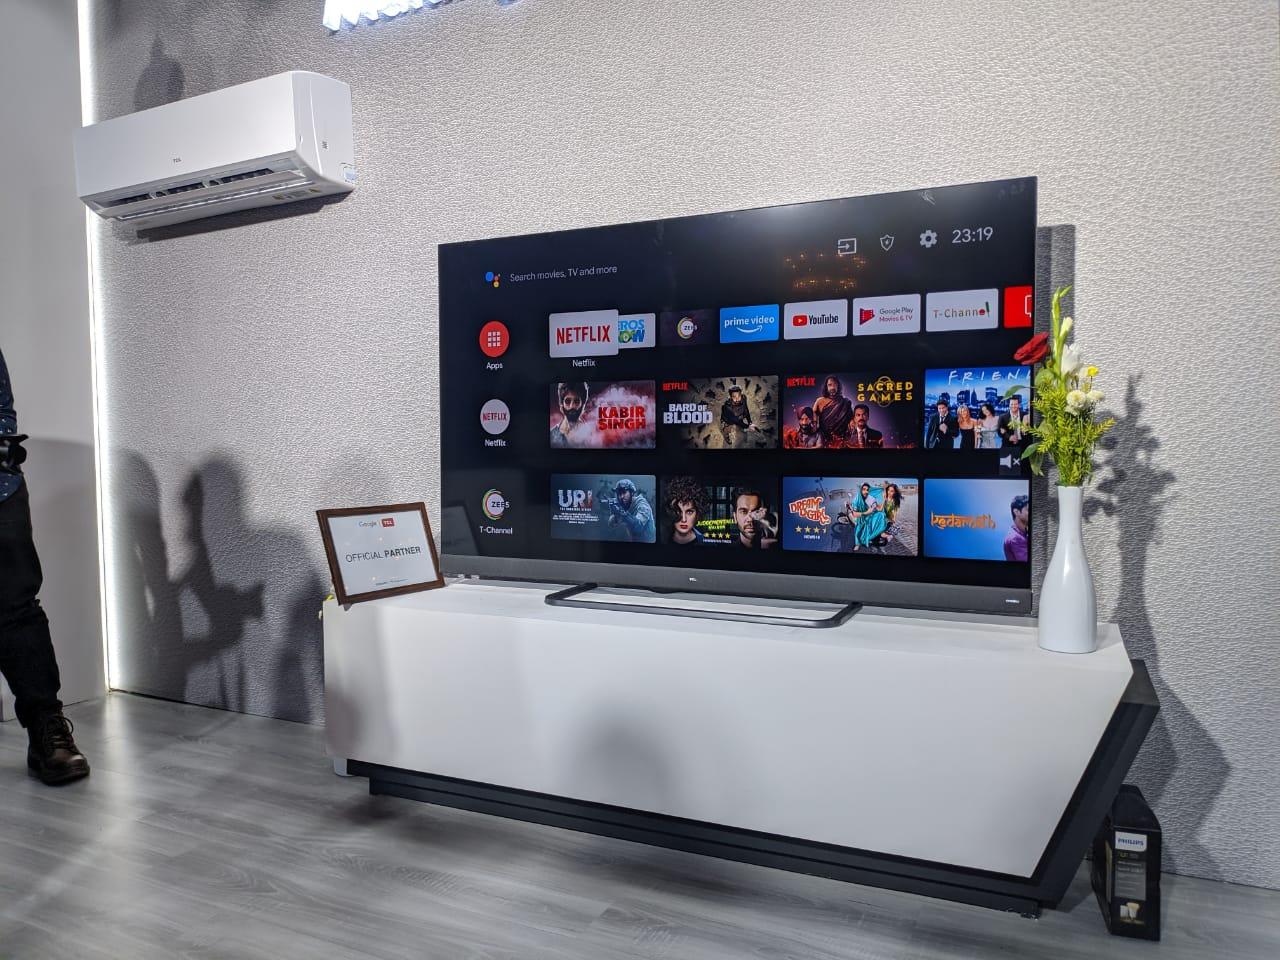 TCL C8 AI Smart TV